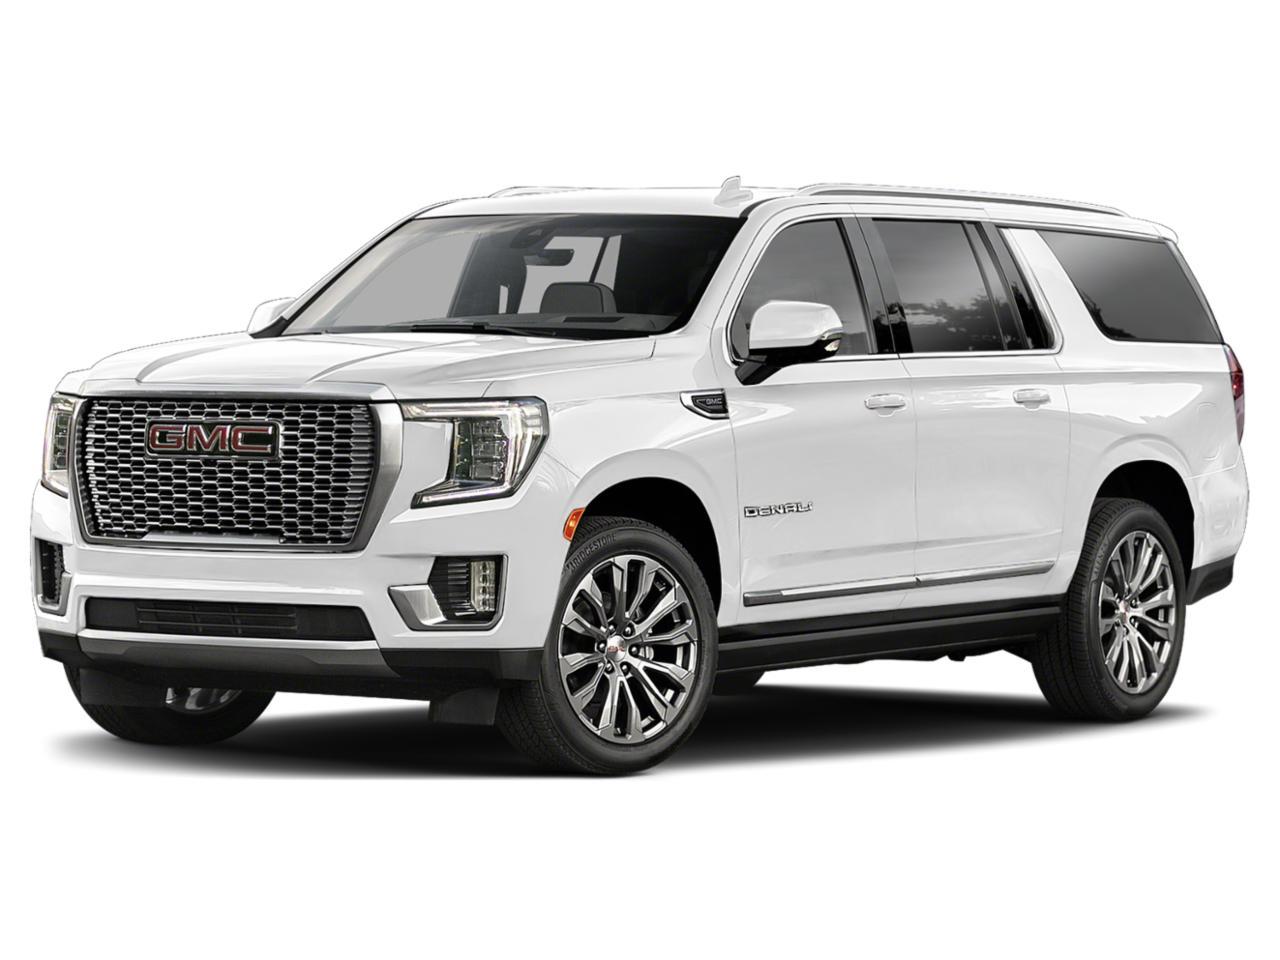 2021 Gmc Yukon Xl For Sale In Grand Rapids 1gks2jkl3mr178572 Todd Wenzel Automotive